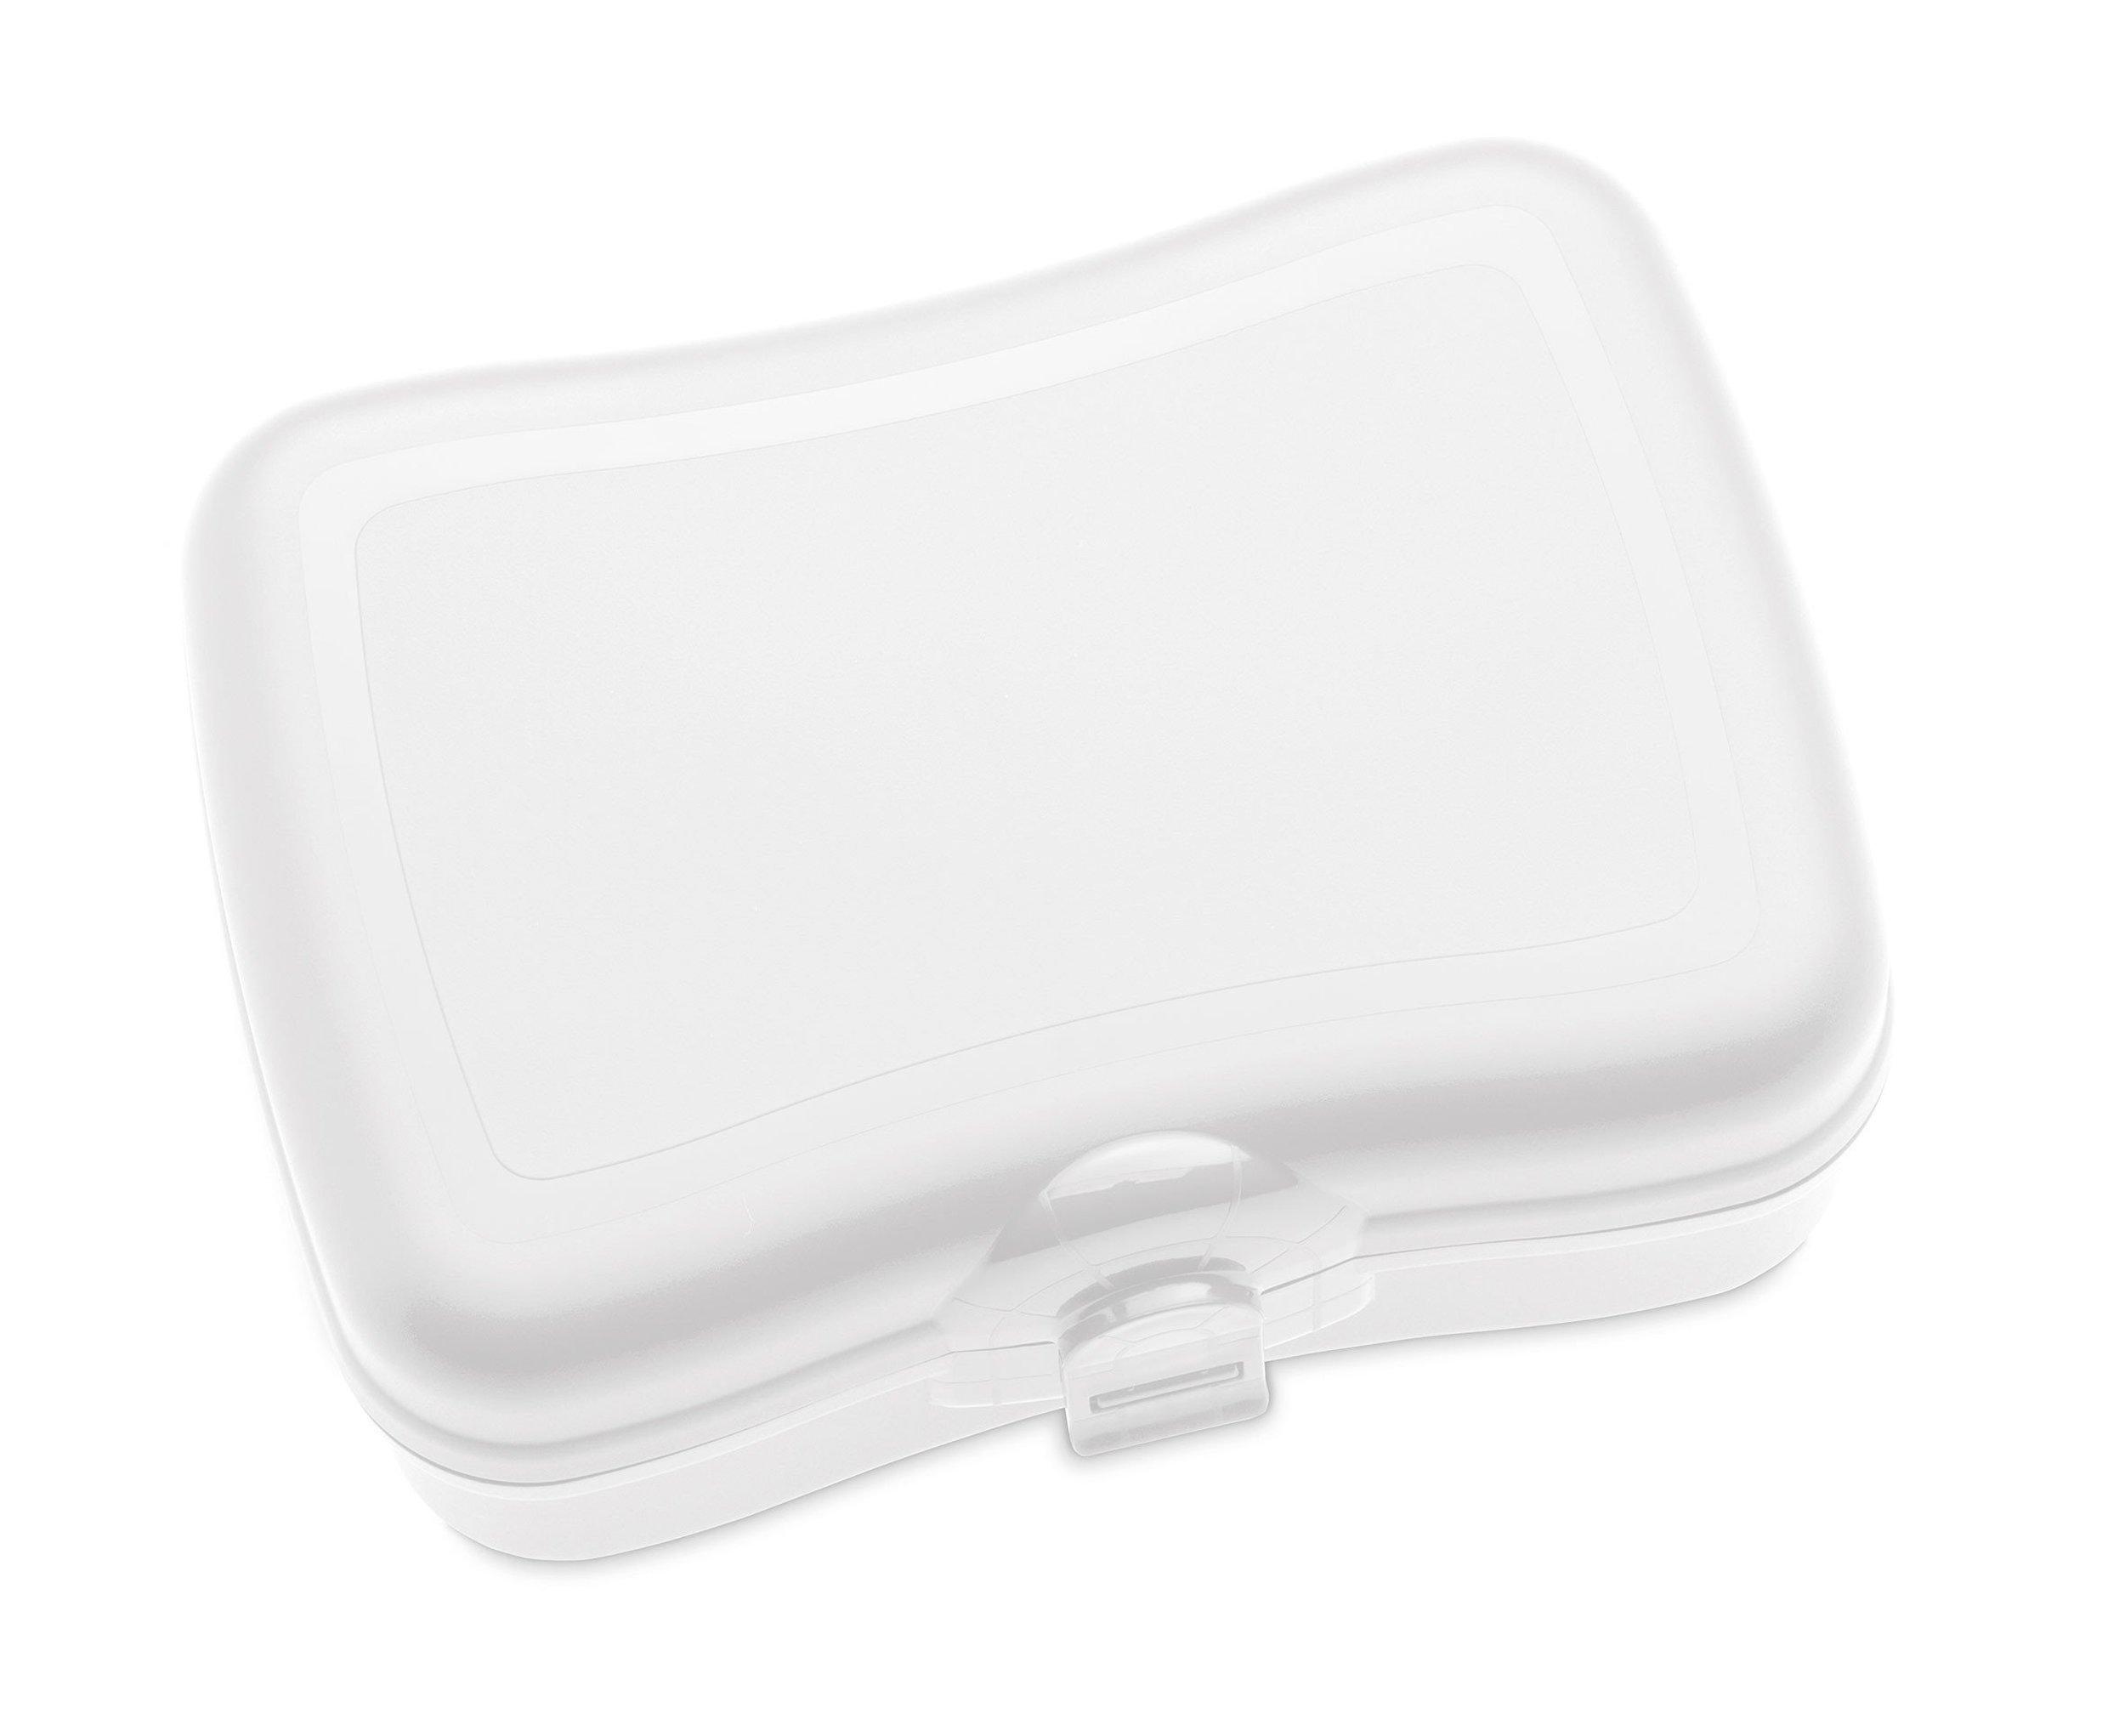 Pudełko na lunch Basic białe